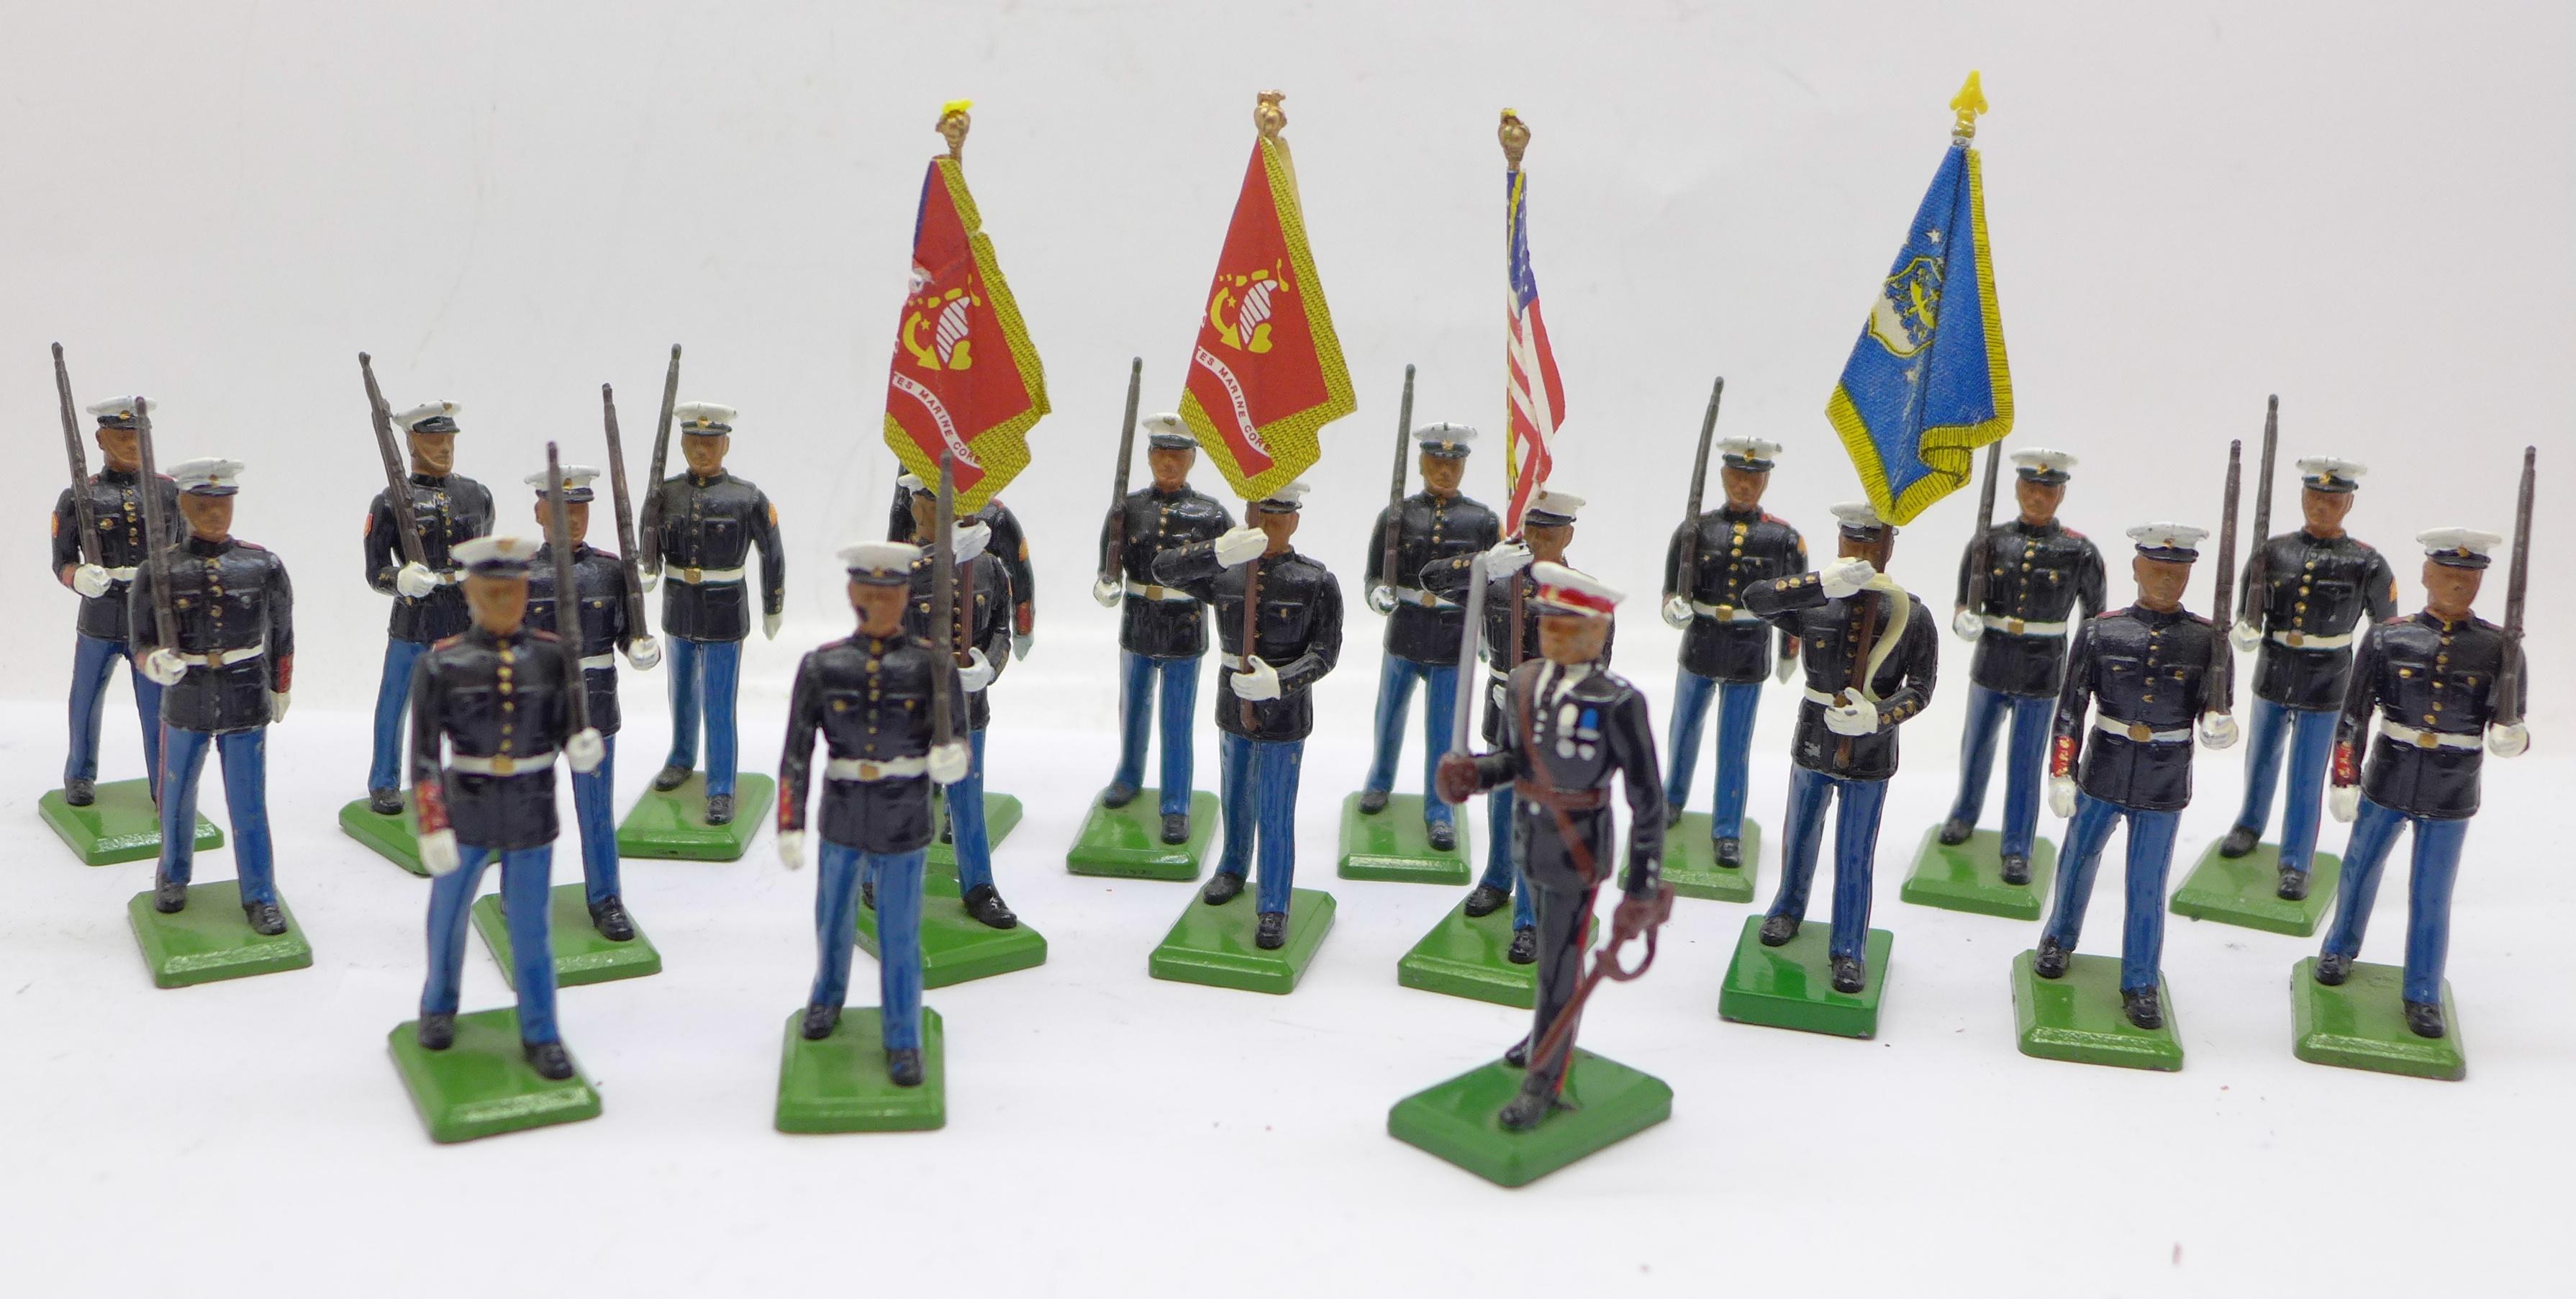 Twenty 1986 Britains Toys marching U.S. Marine figures